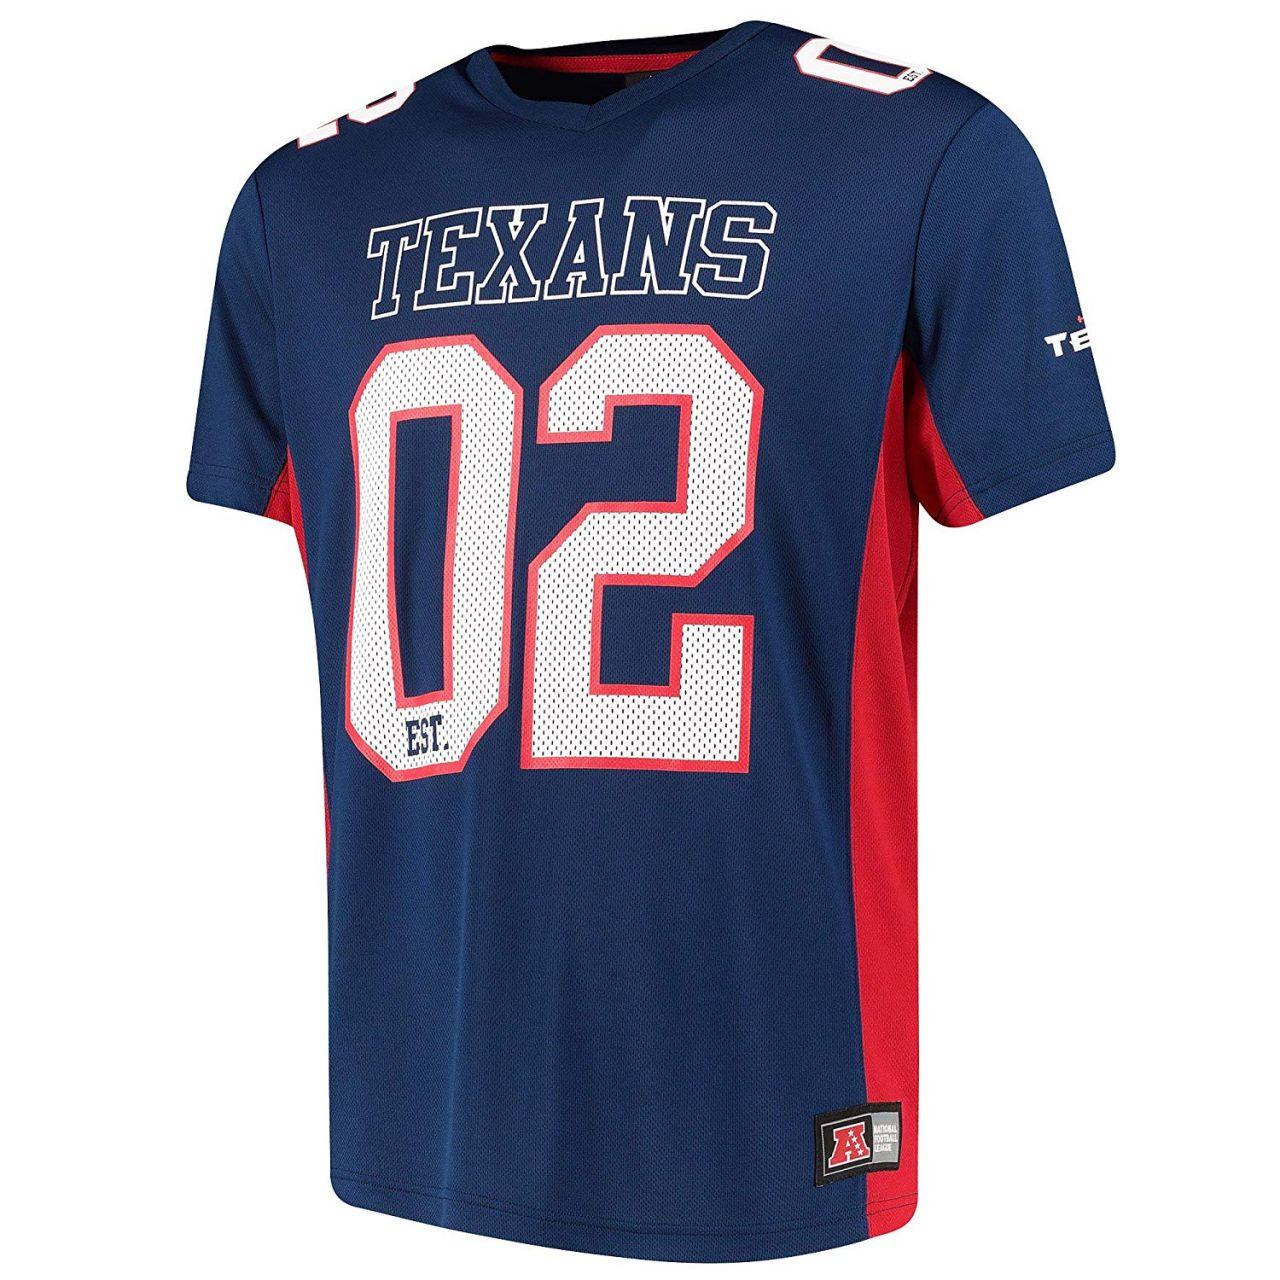 amfoo - Majestic NFL Mesh Polyester Jersey Shirt - Houston Texans